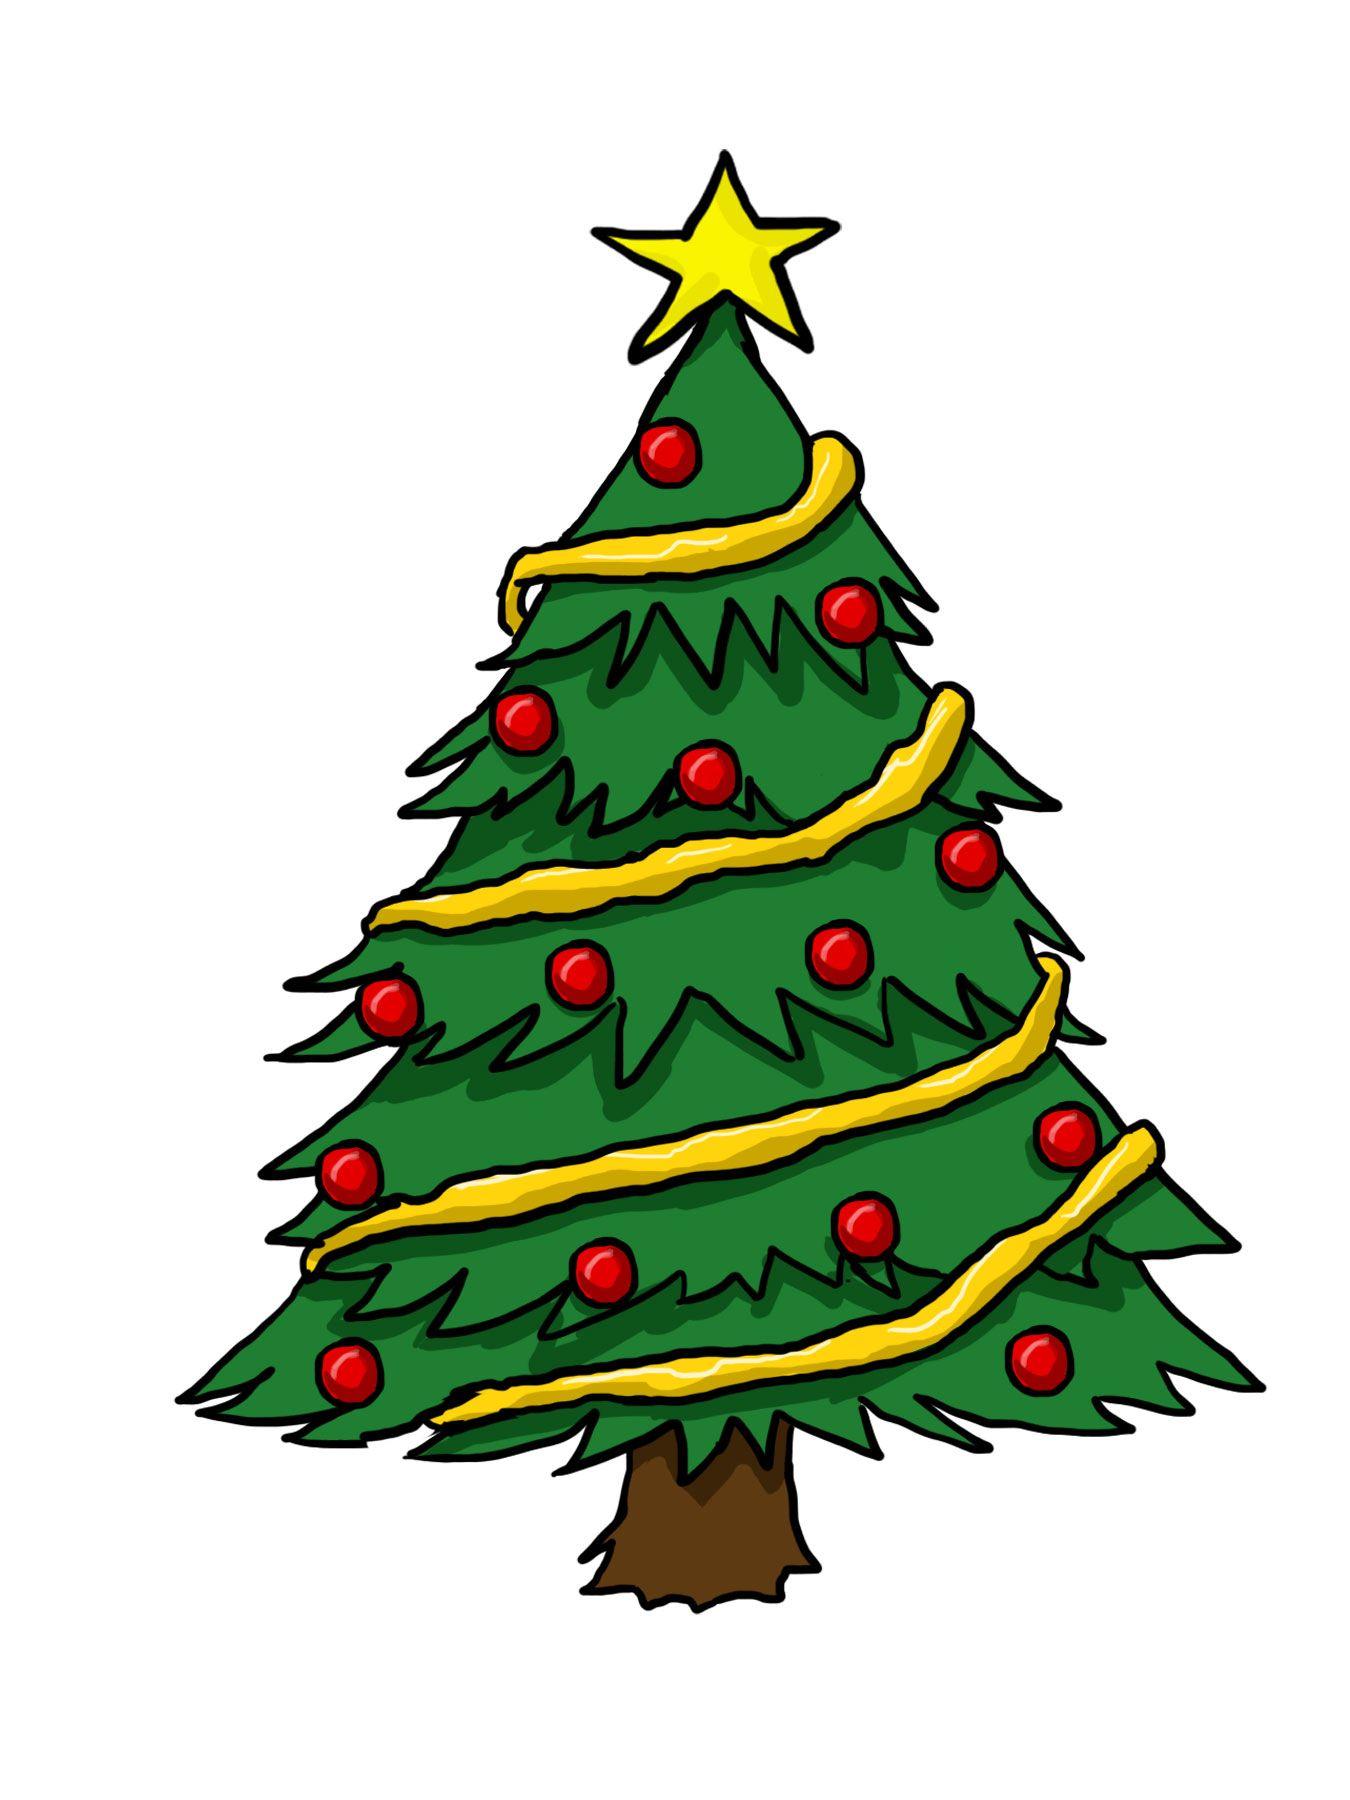 11 Charming Christmas Tree Clipart Christmas Tree Drawing Christmas Tree Clipart Christmas Tree Coloring Page